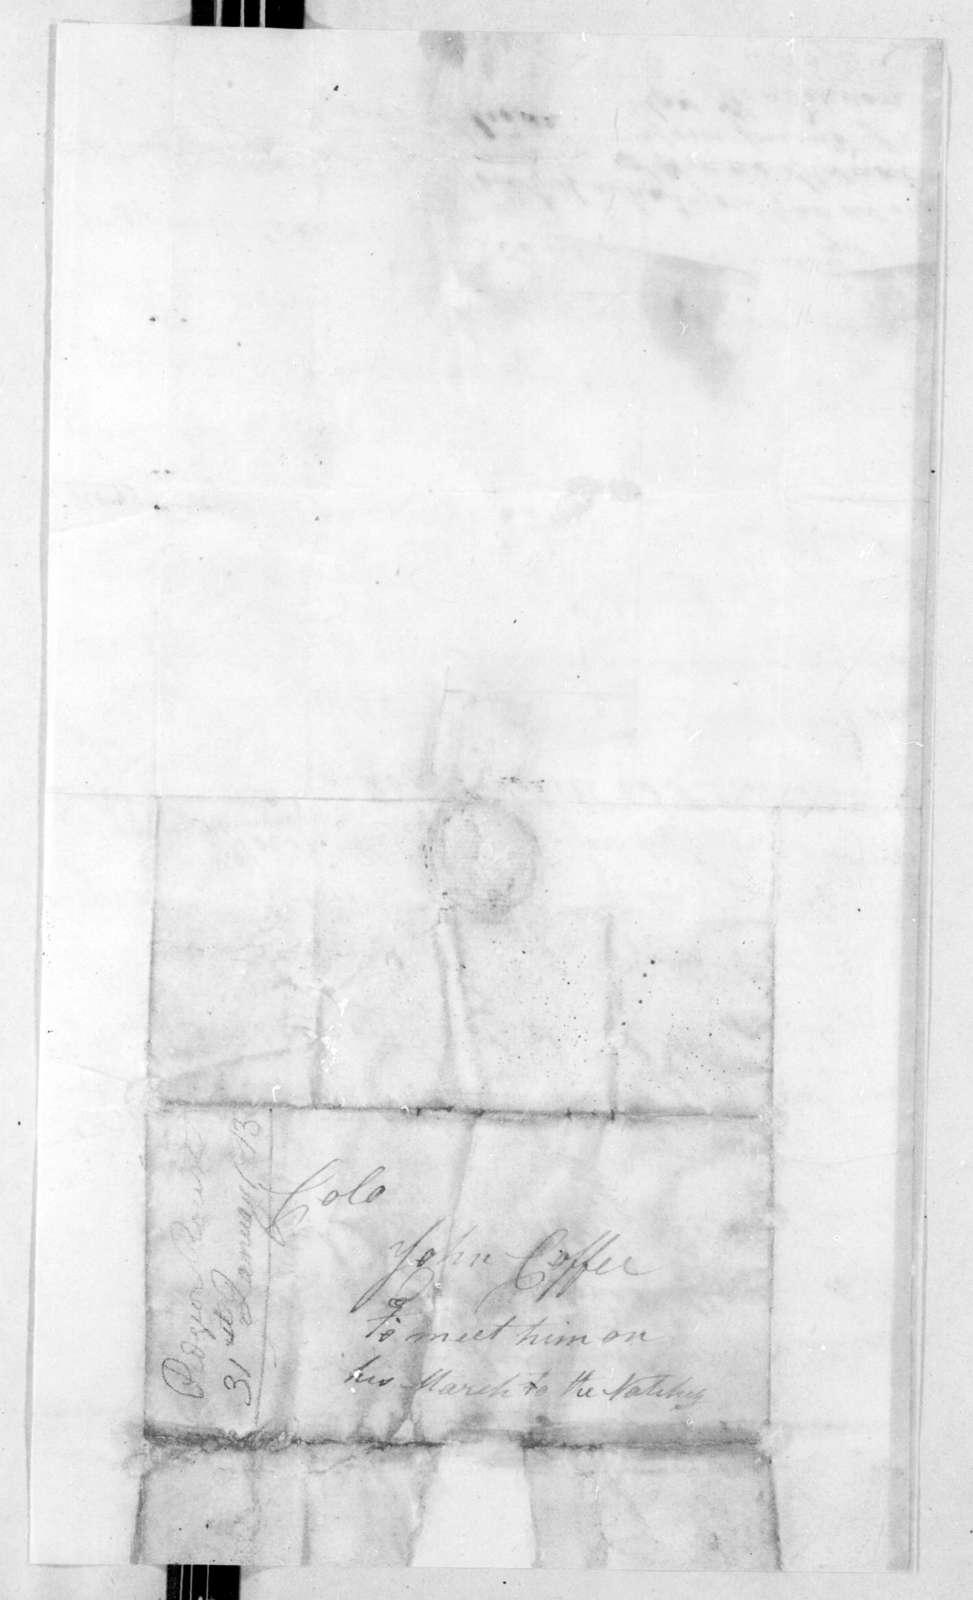 James Henderson to John Coffee, January 31, 1813